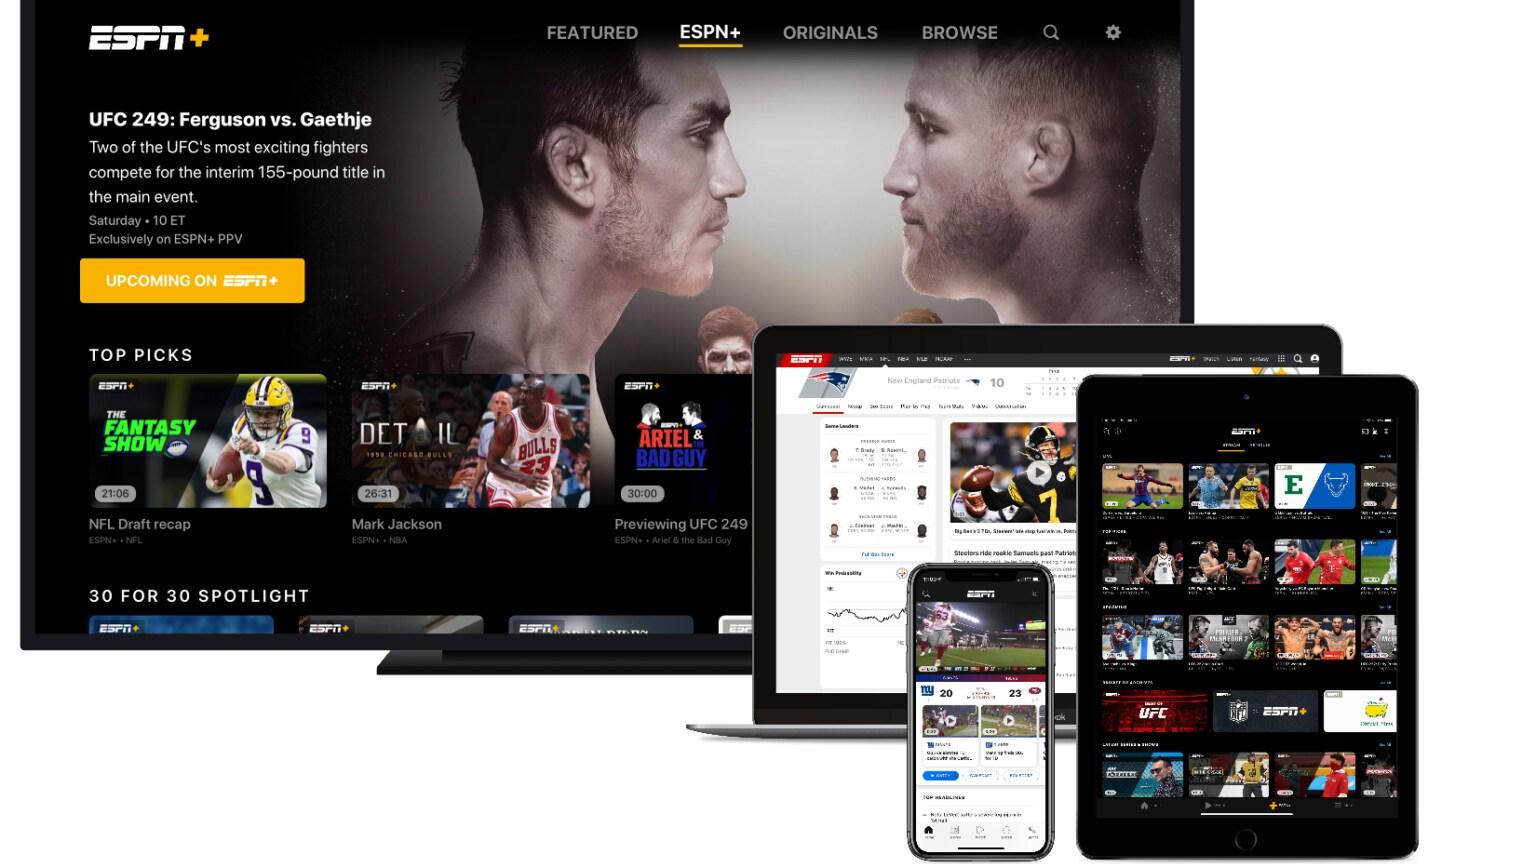 ESPN Digital Celebrates Three Years as the No. 1 U.S. Sports Property, Logs Best February on Record